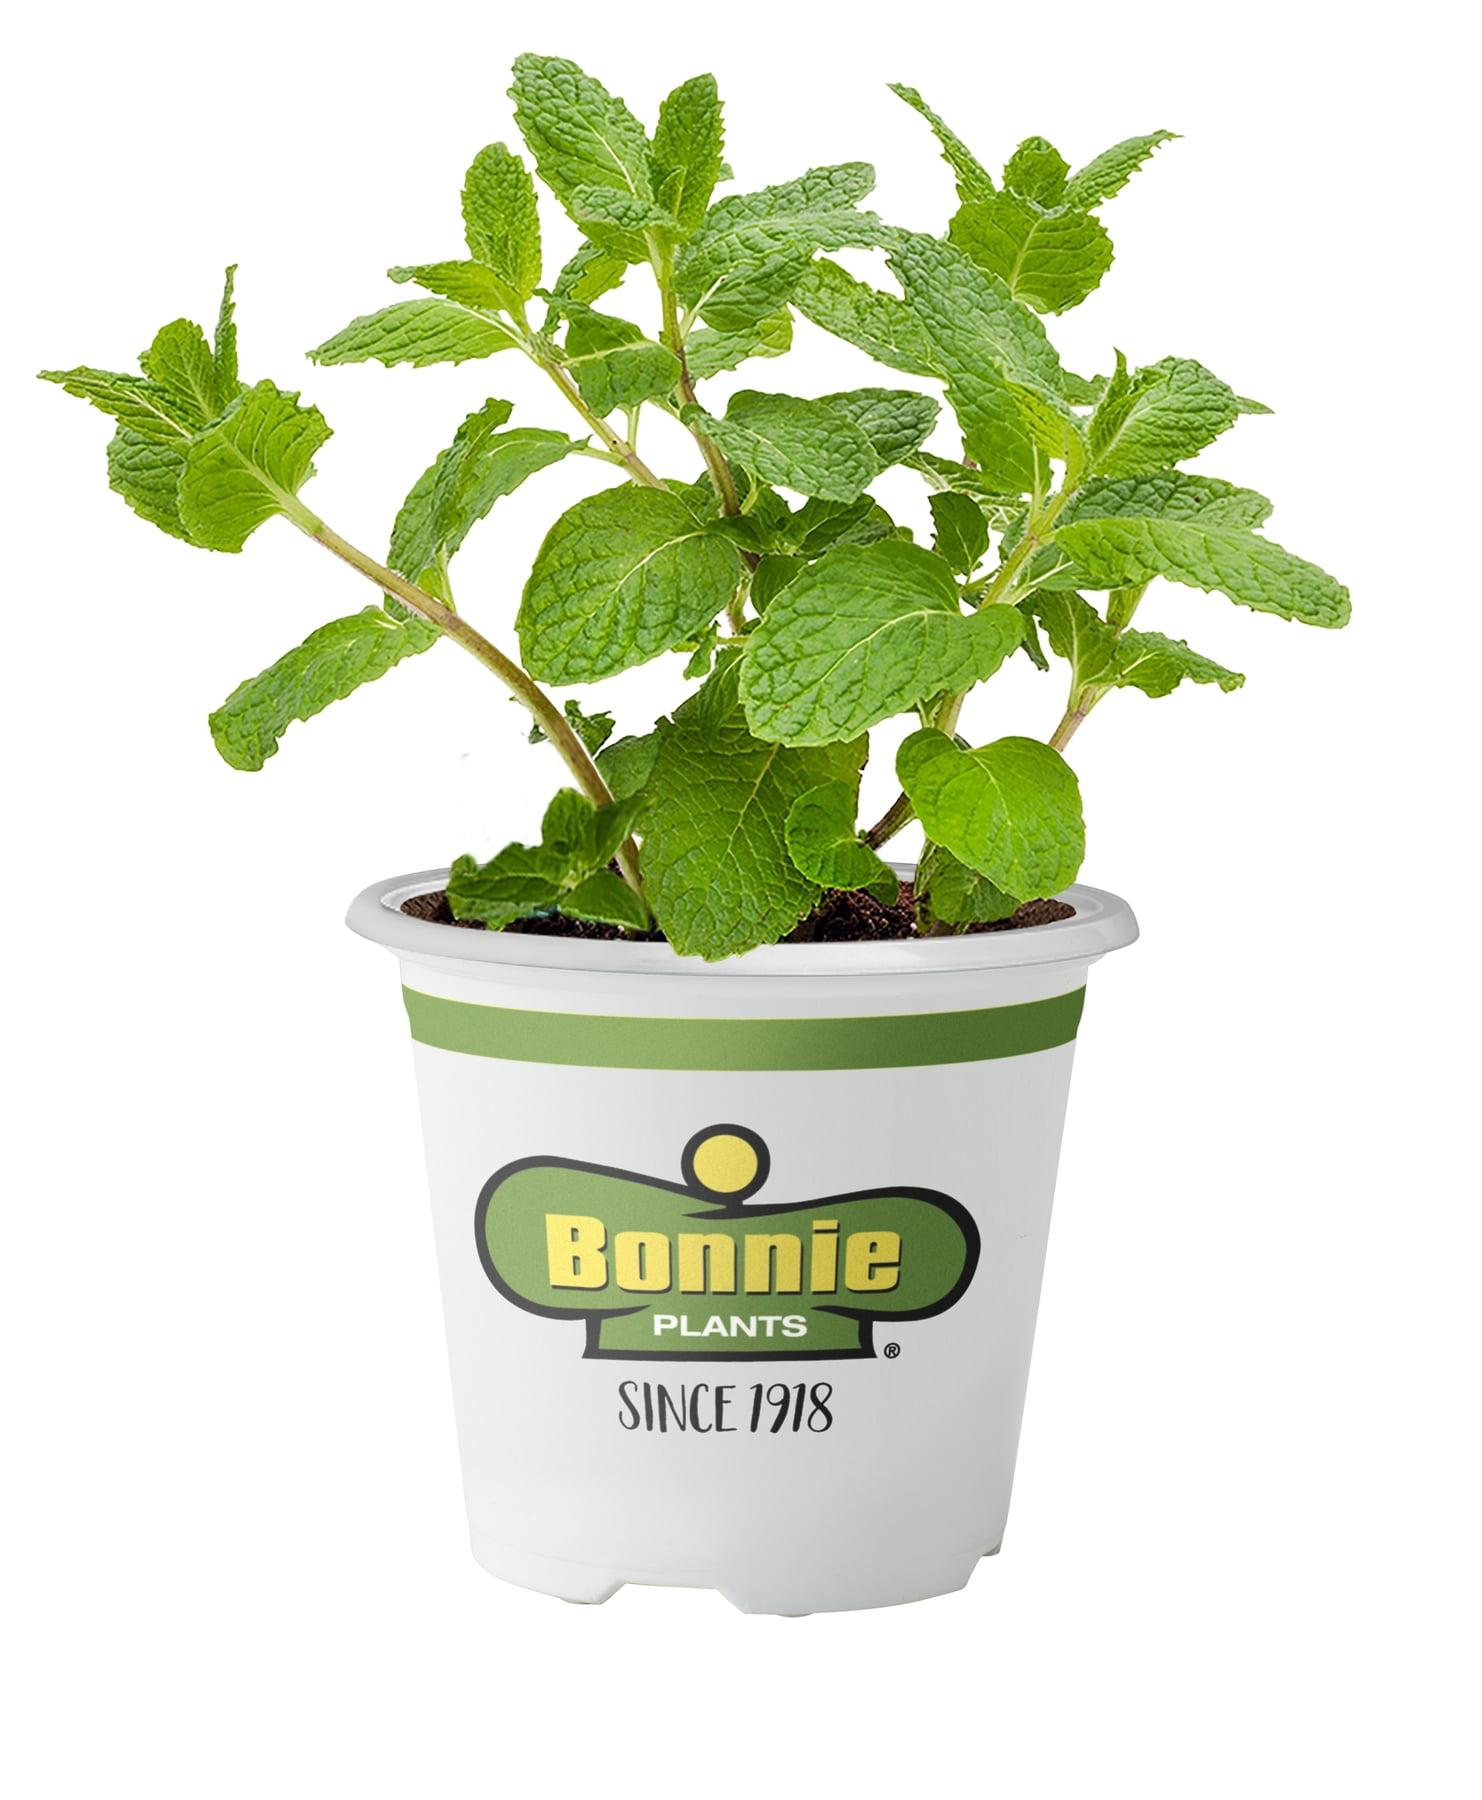 251b25bfeaa7 Bonnie Plants Sweet Mint (Live Plant)